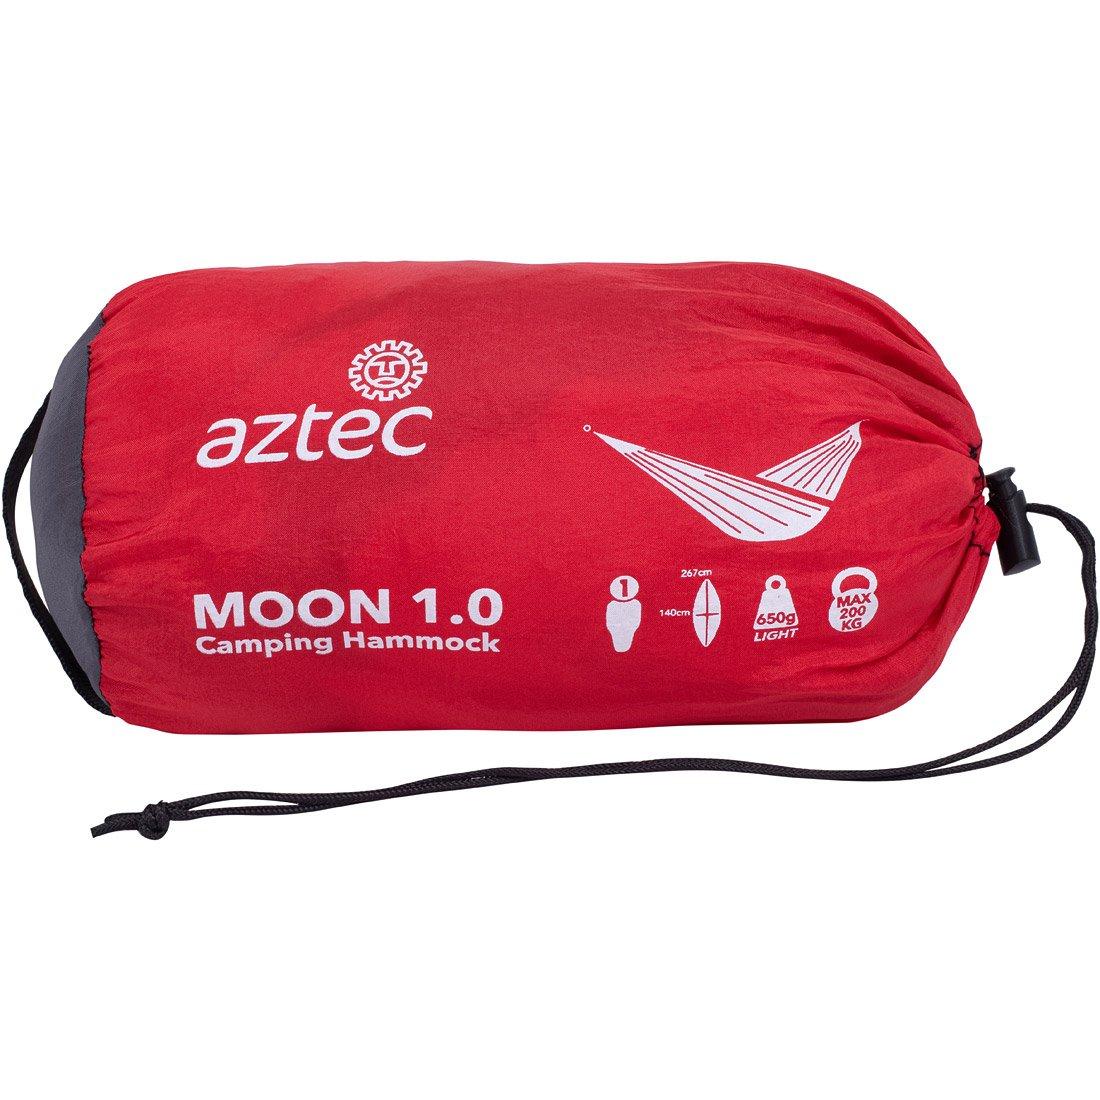 ערסל - Moon 1.0 - Aztec